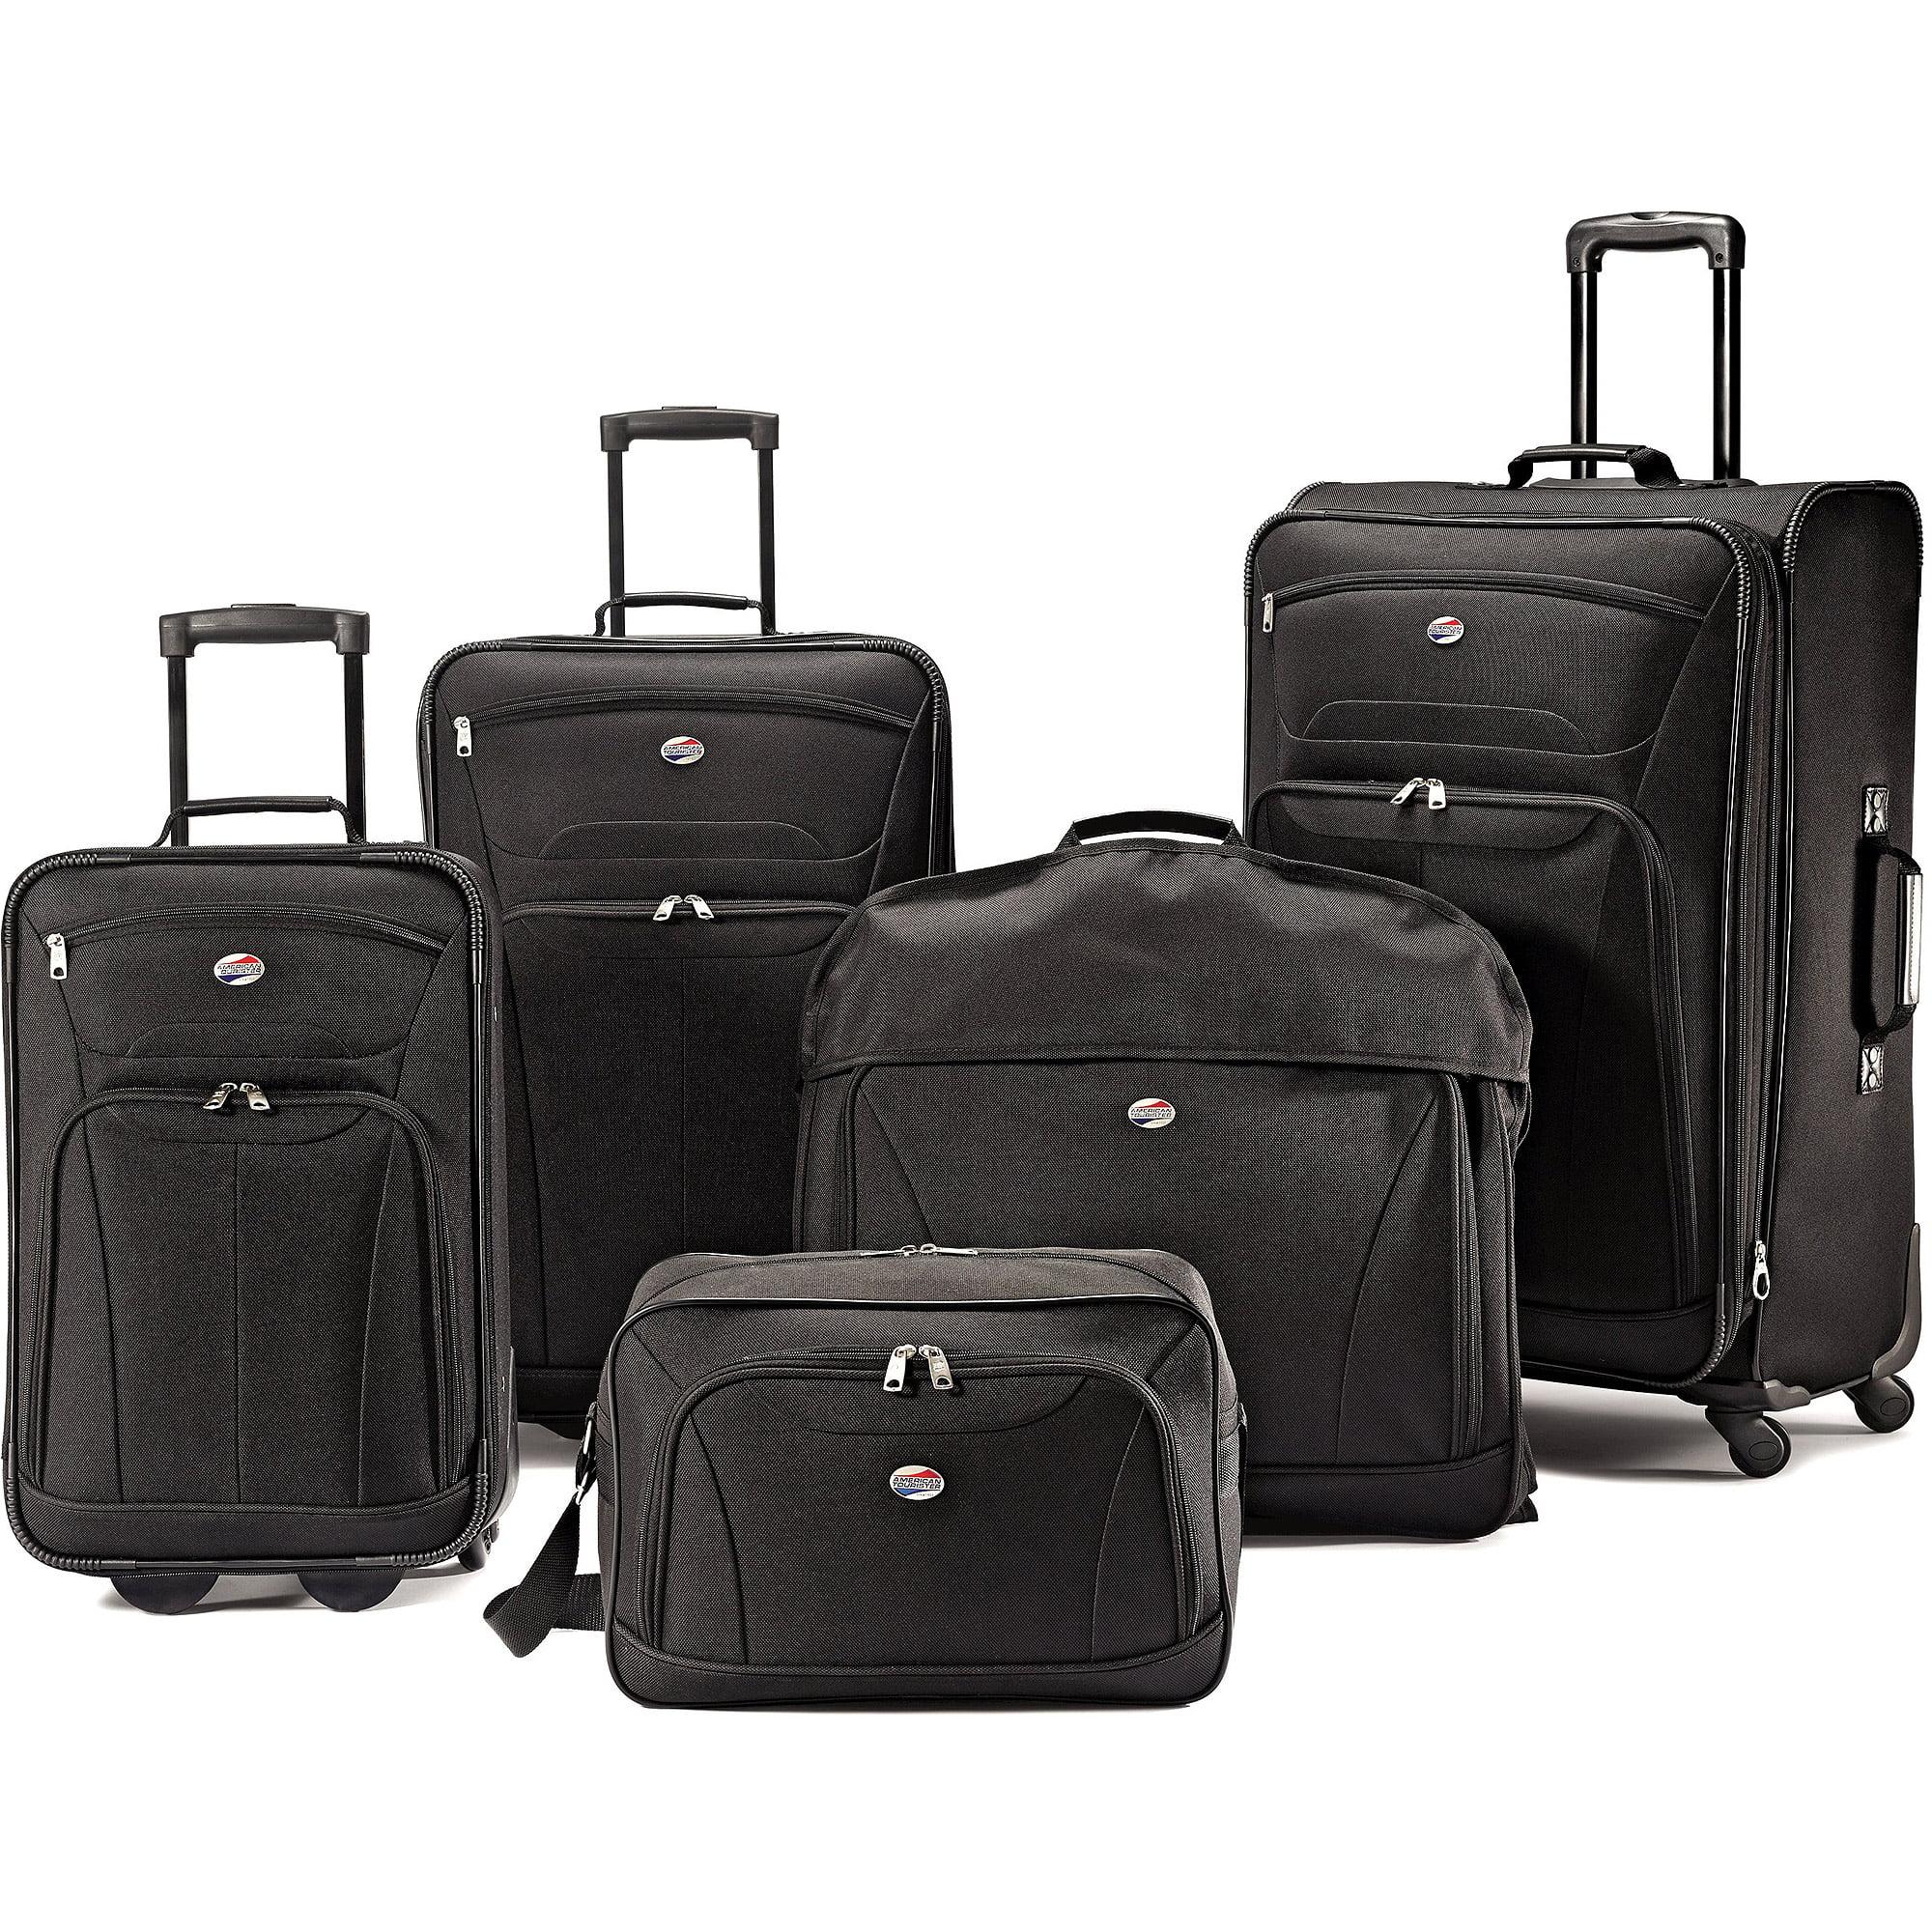 American Tourister 5-Piece Luggage Set